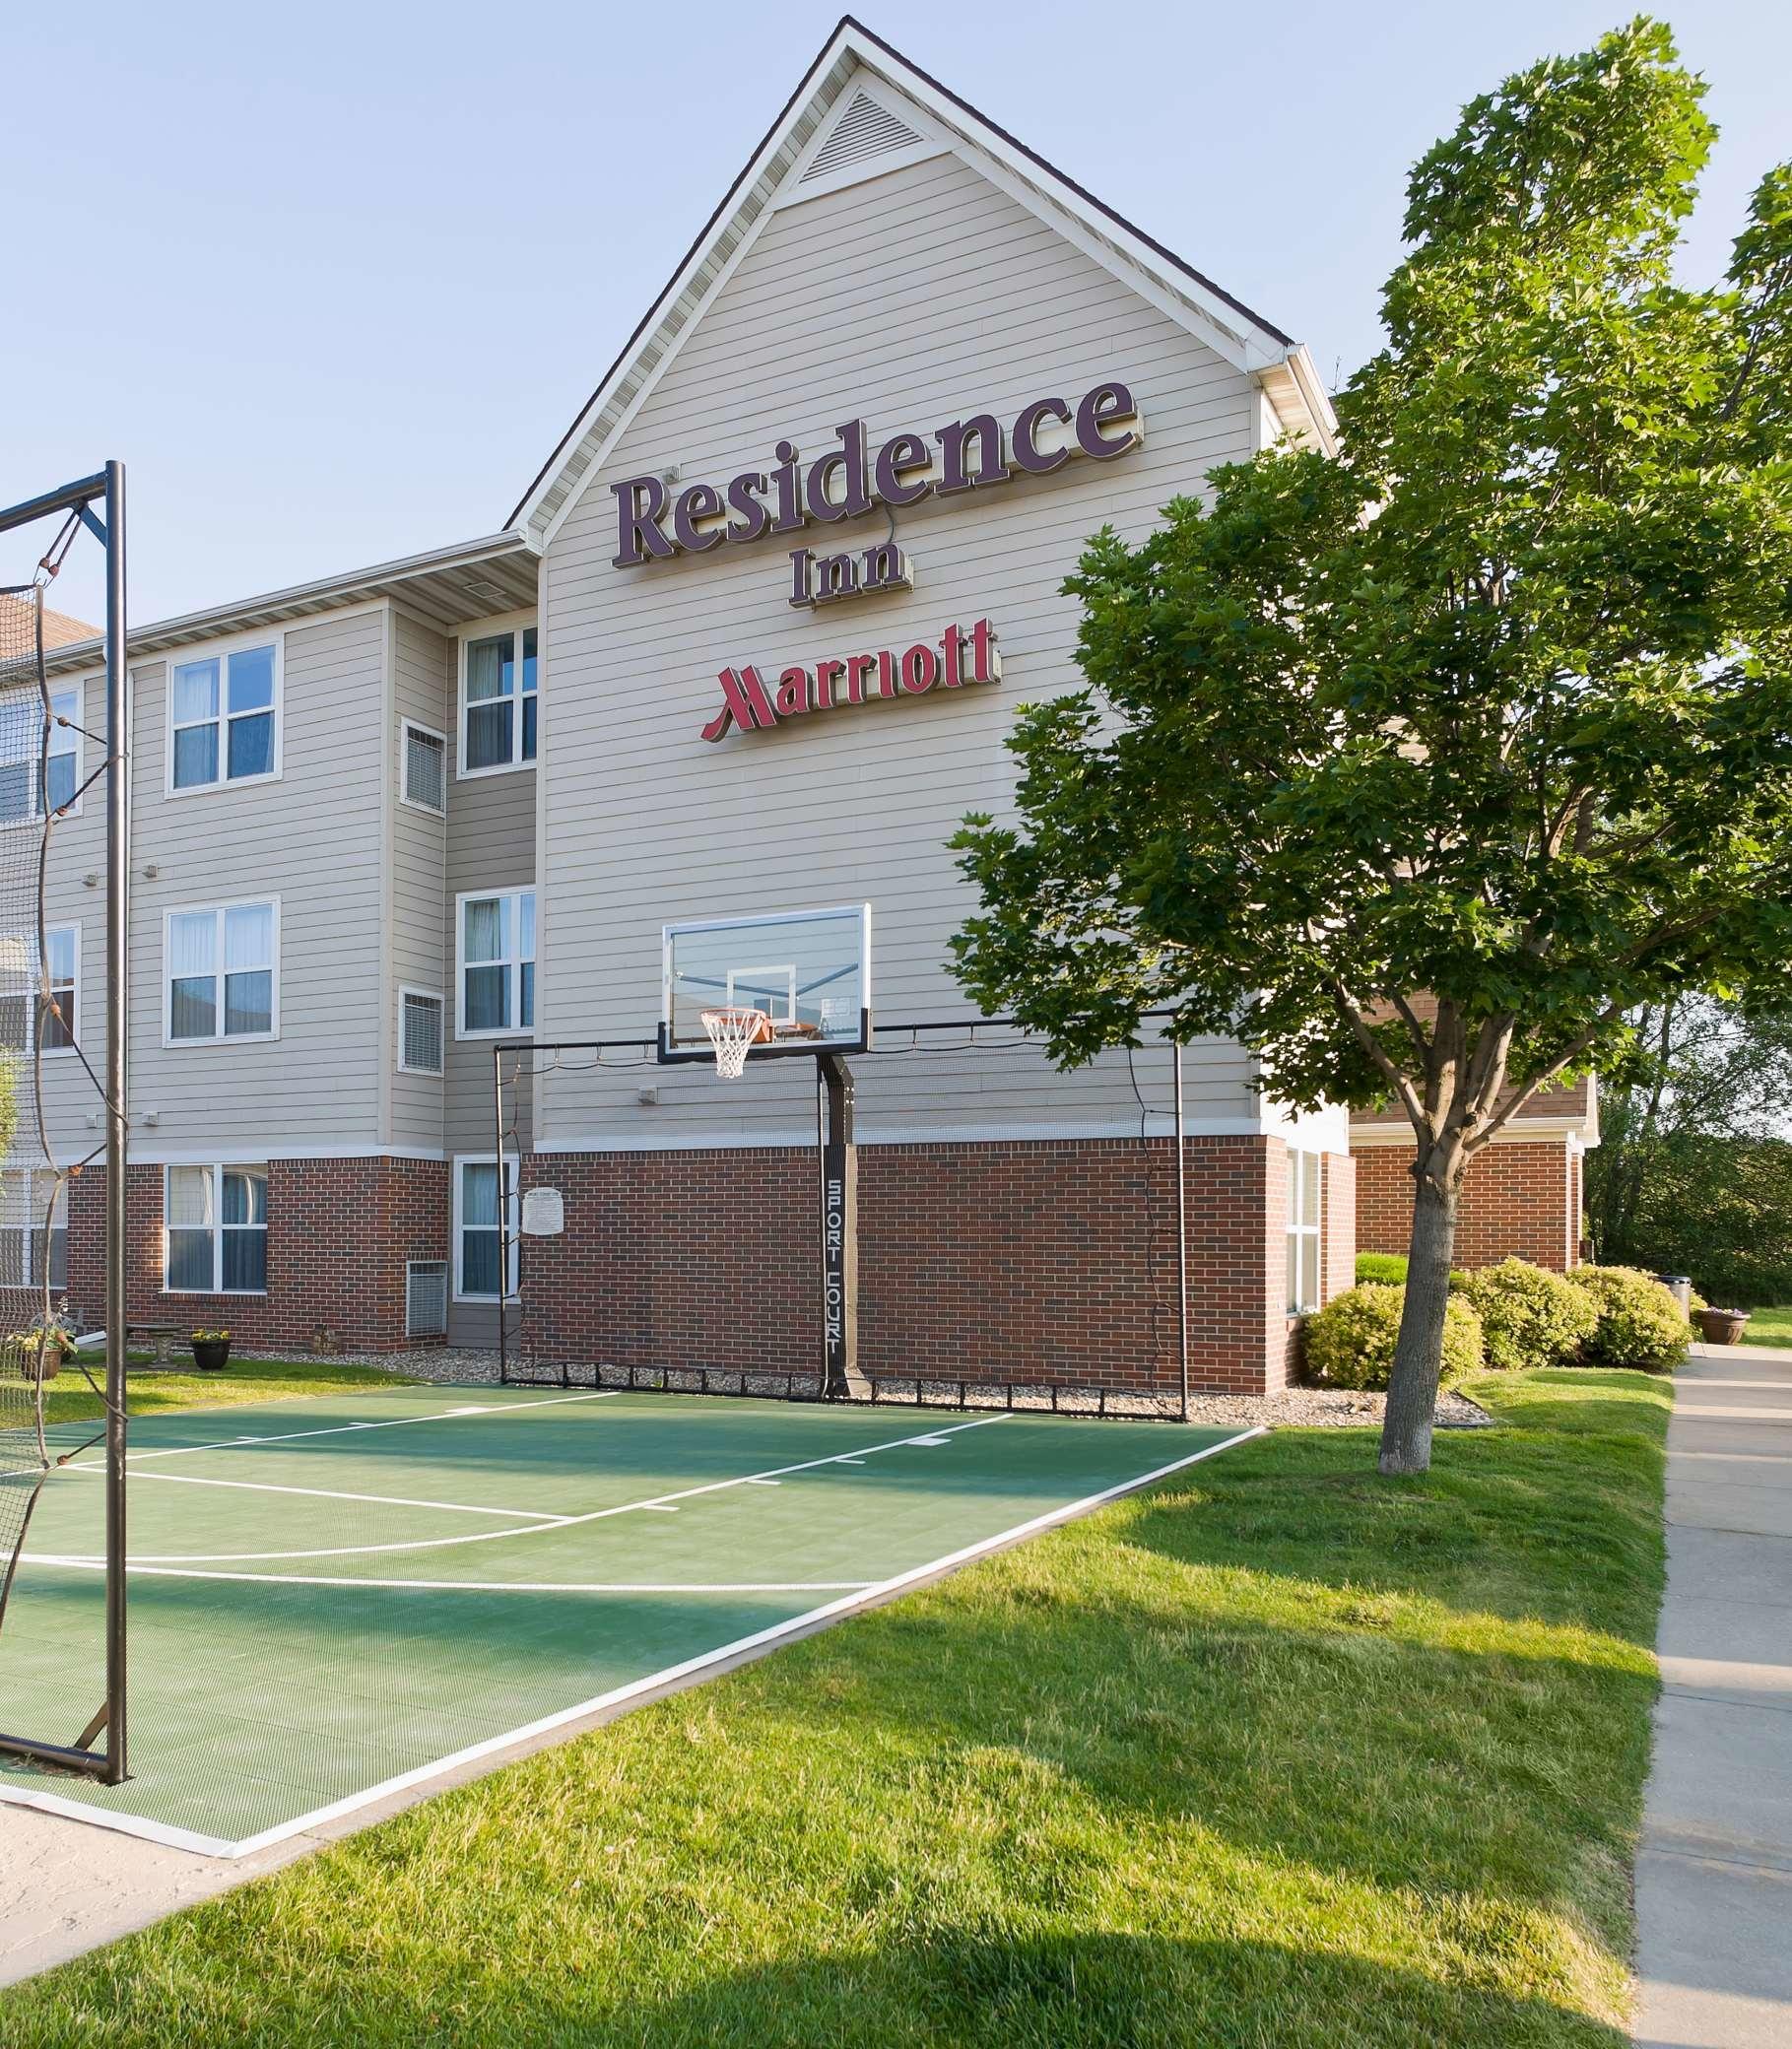 Residence Inn by Marriott Cedar Rapids image 15